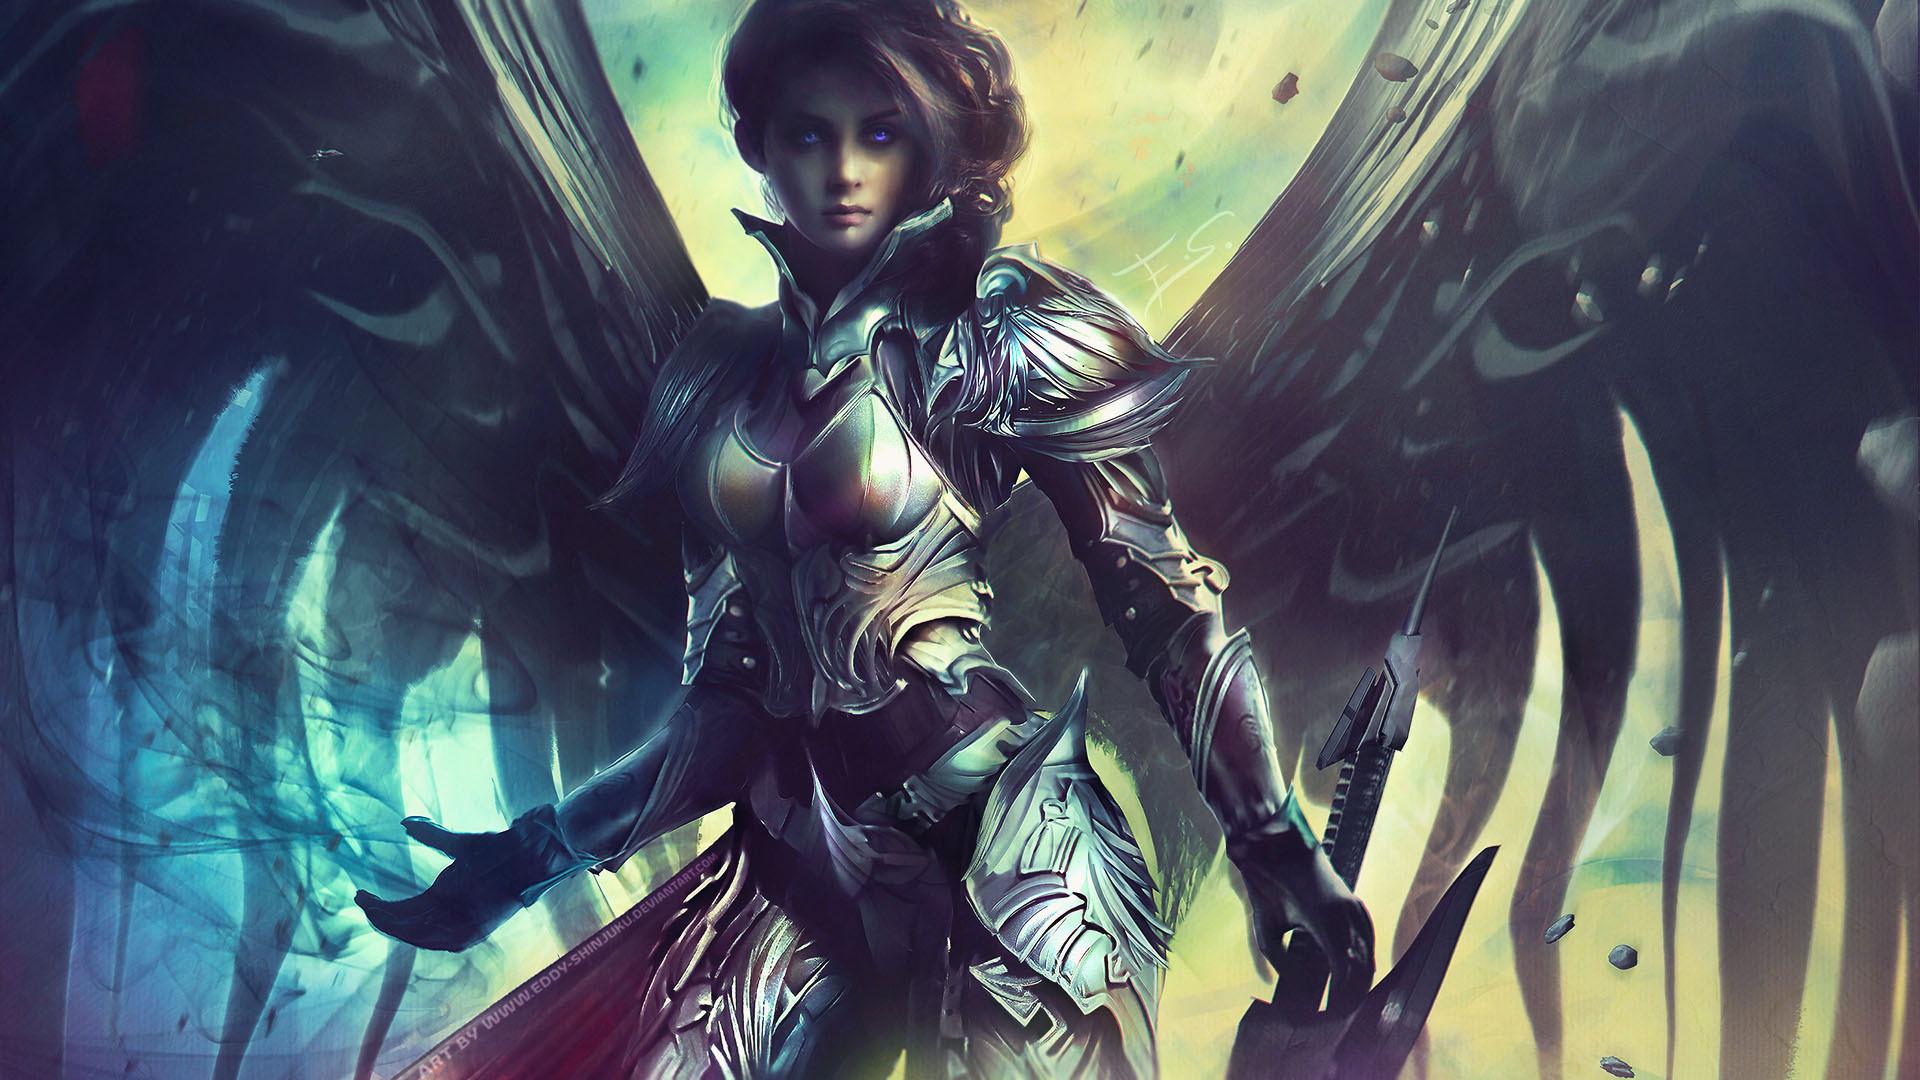 Dark Angel Female Warrior wallpaper from Warriors wallpapers